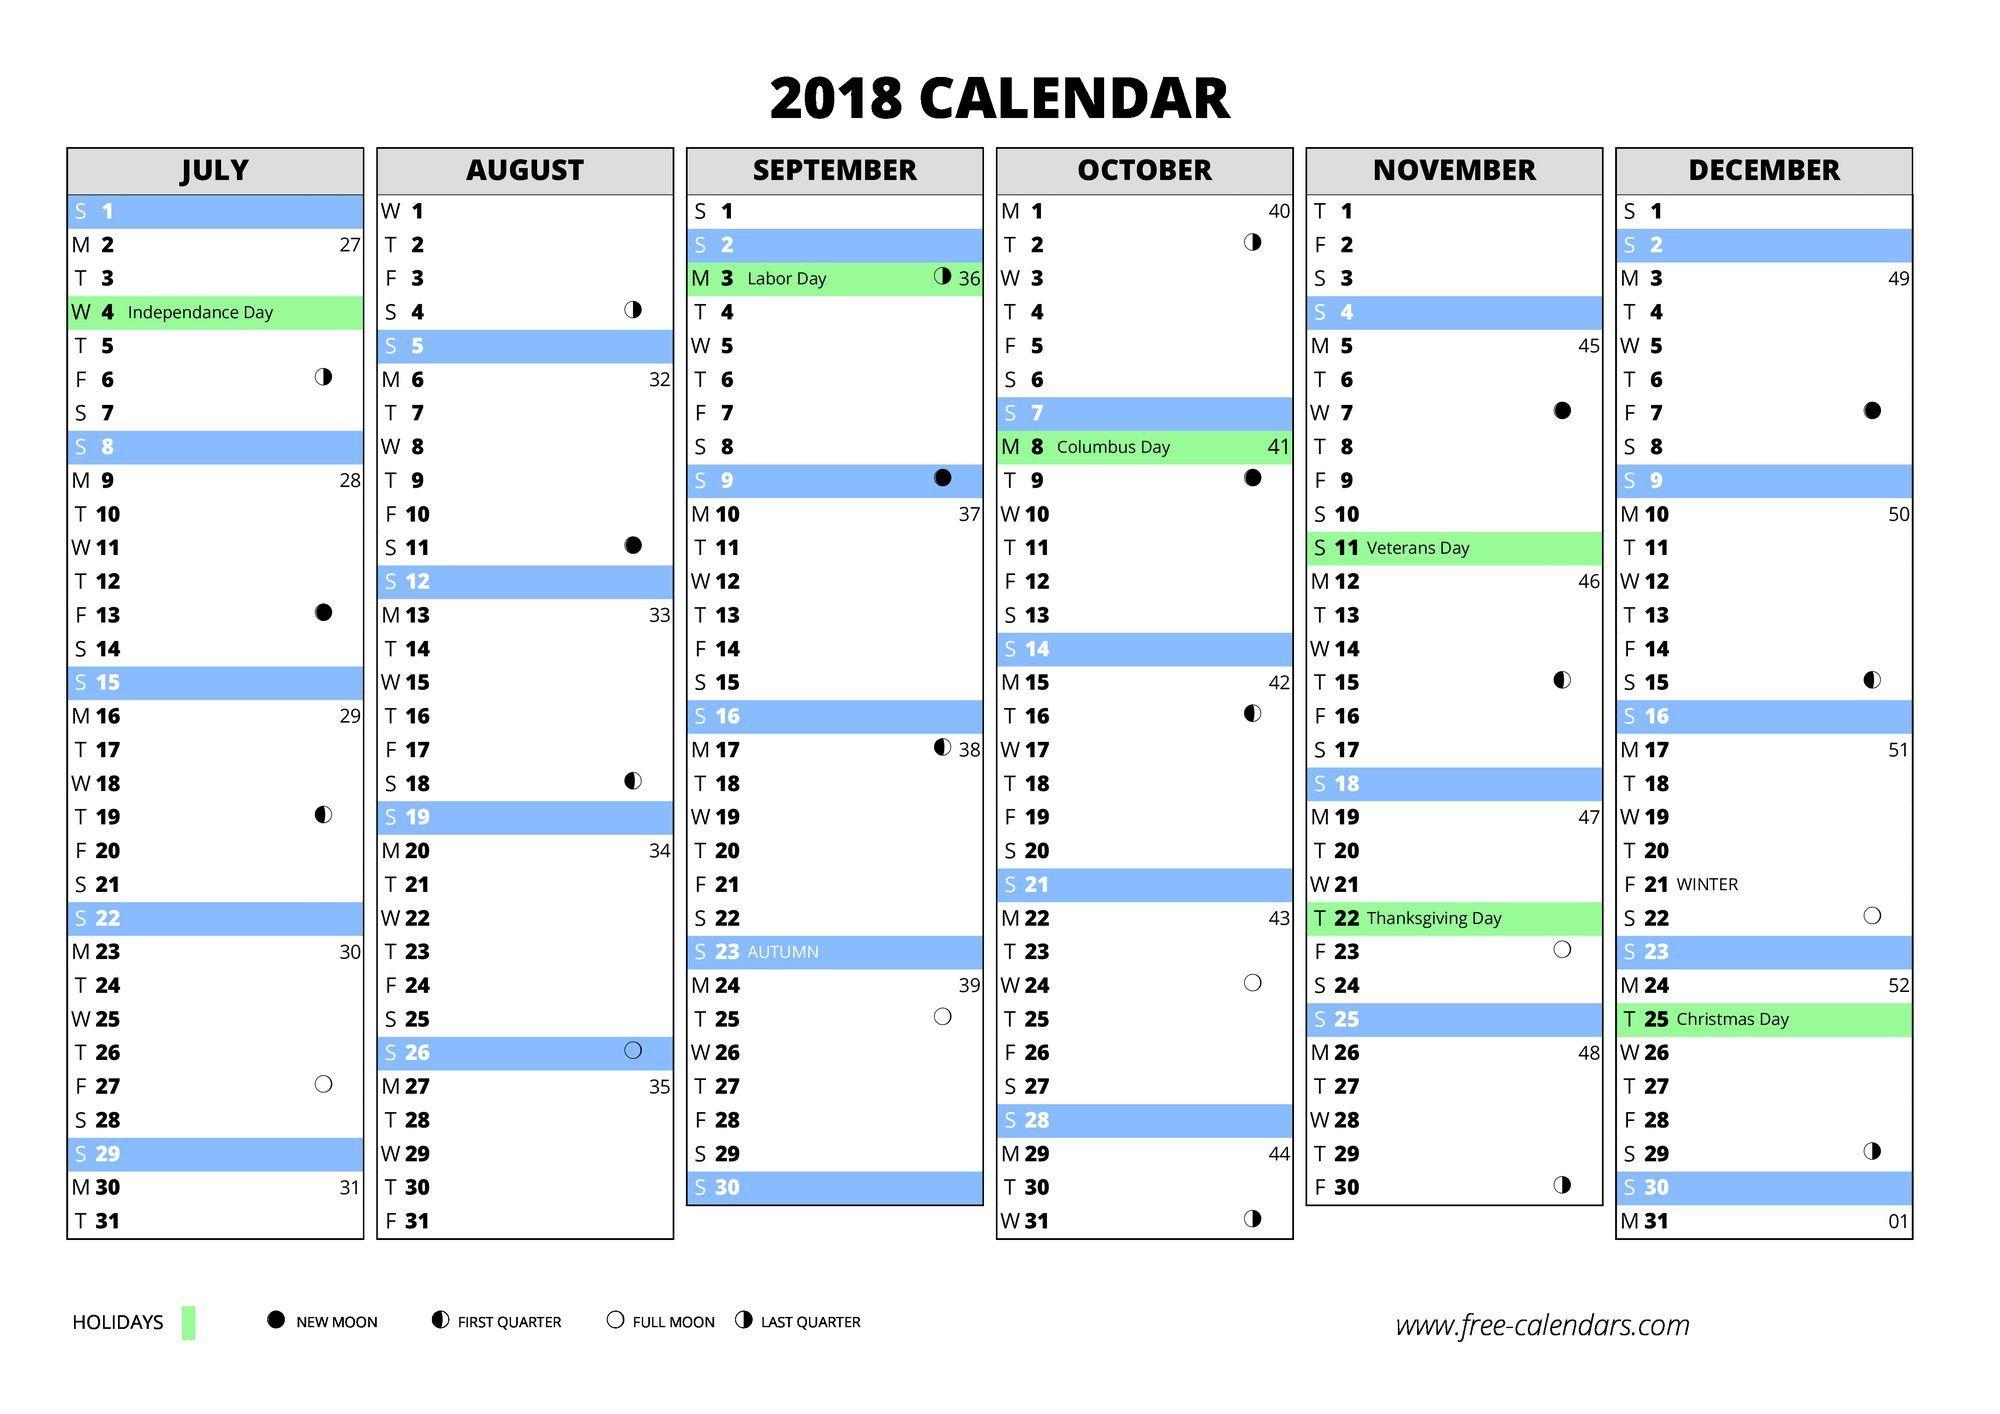 005 Fascinating Free Printable Weekly Calendar Template 2018 Design Full